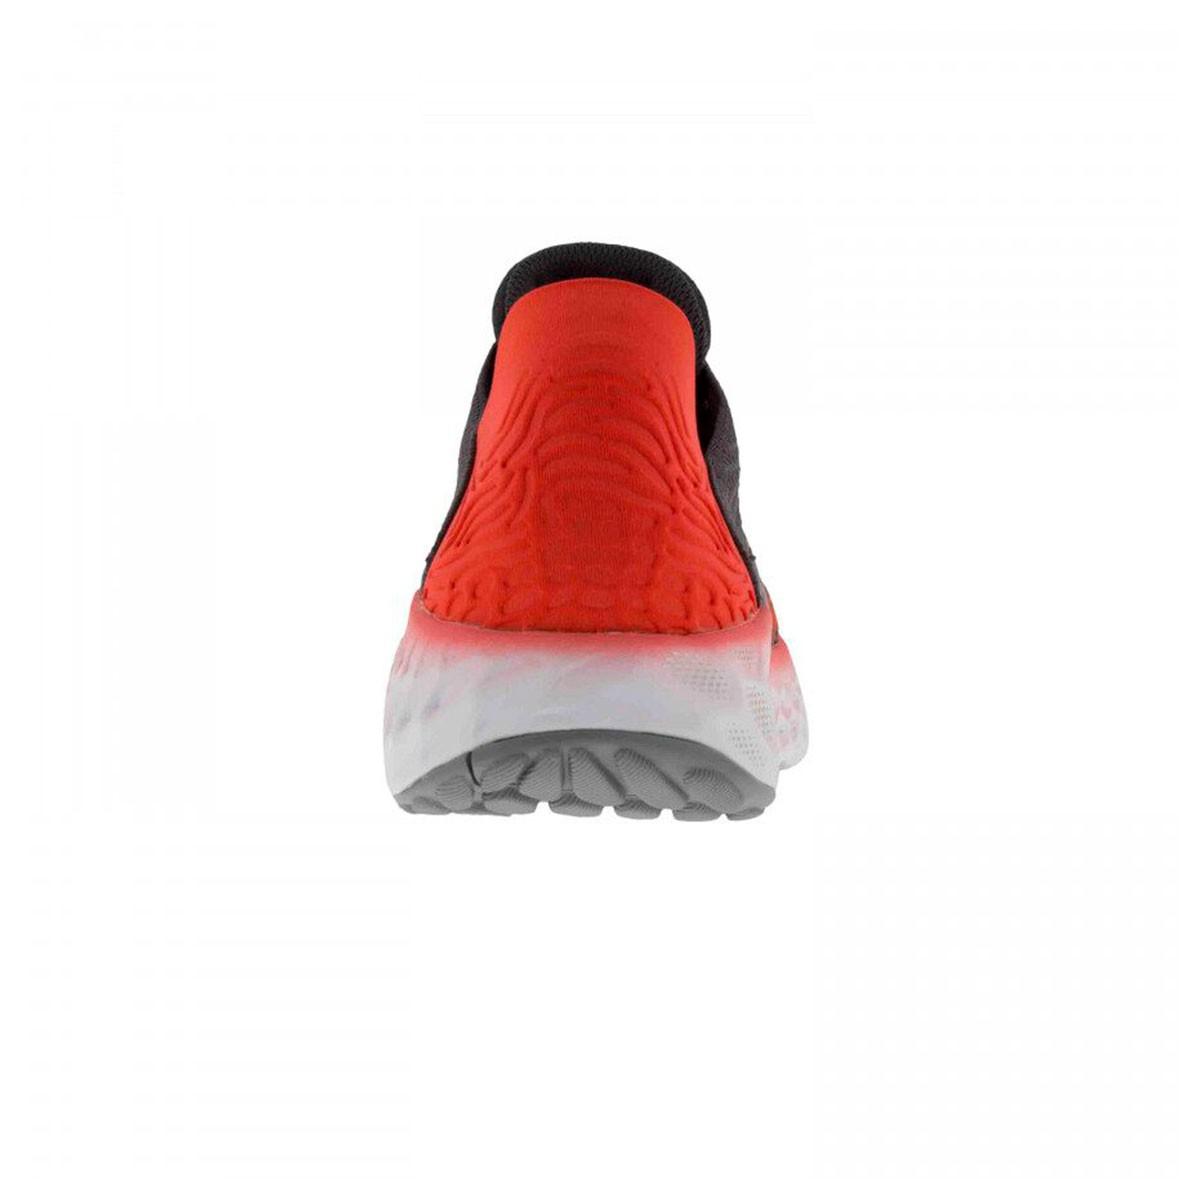 Tênis New Balance FreshFoam 1080v10 Masculino Preto Vermelho